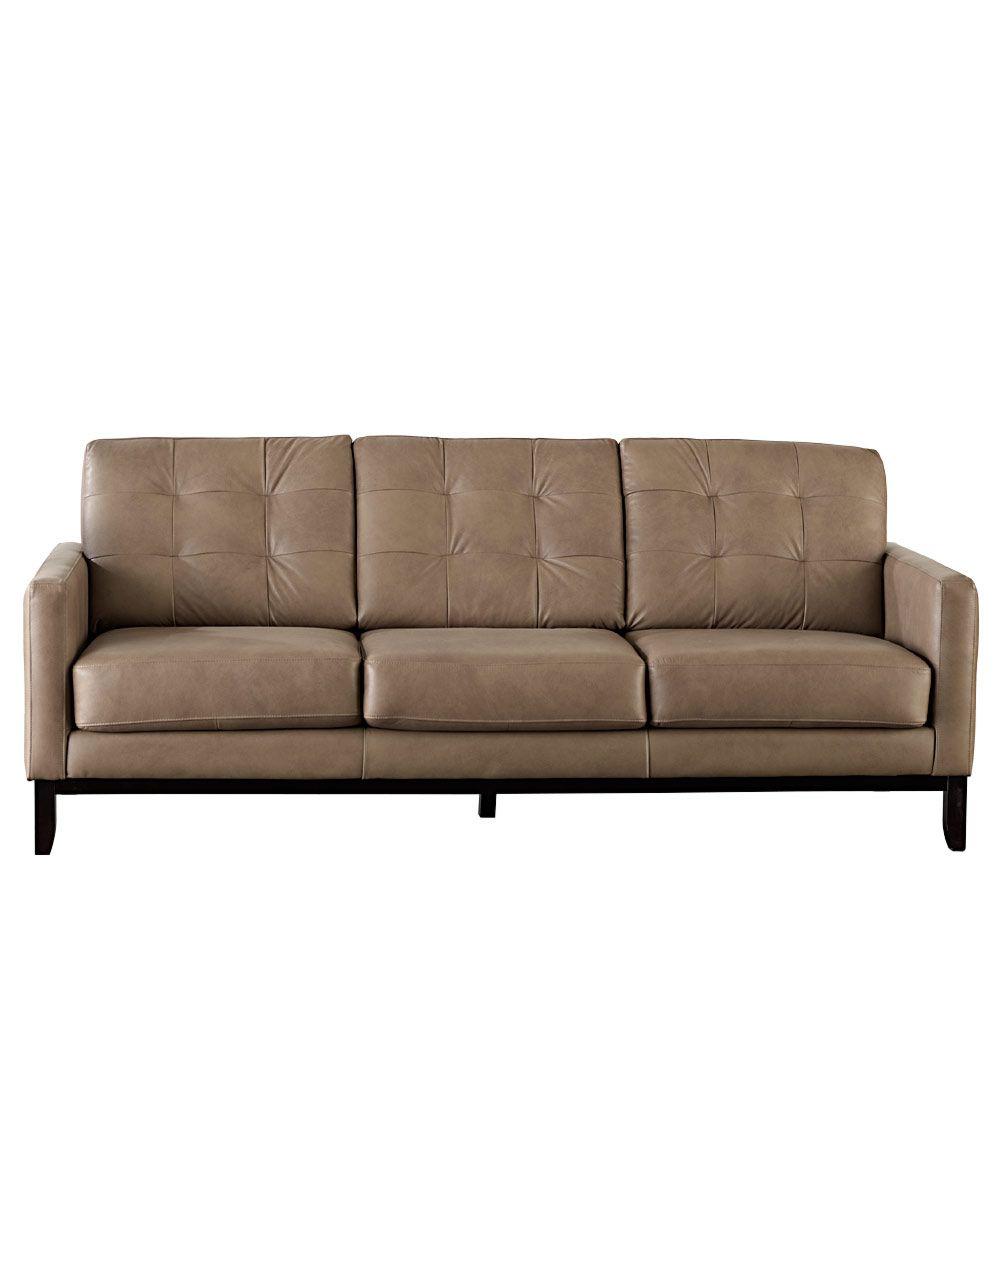 Dawson Tufted Back Leather Sofa